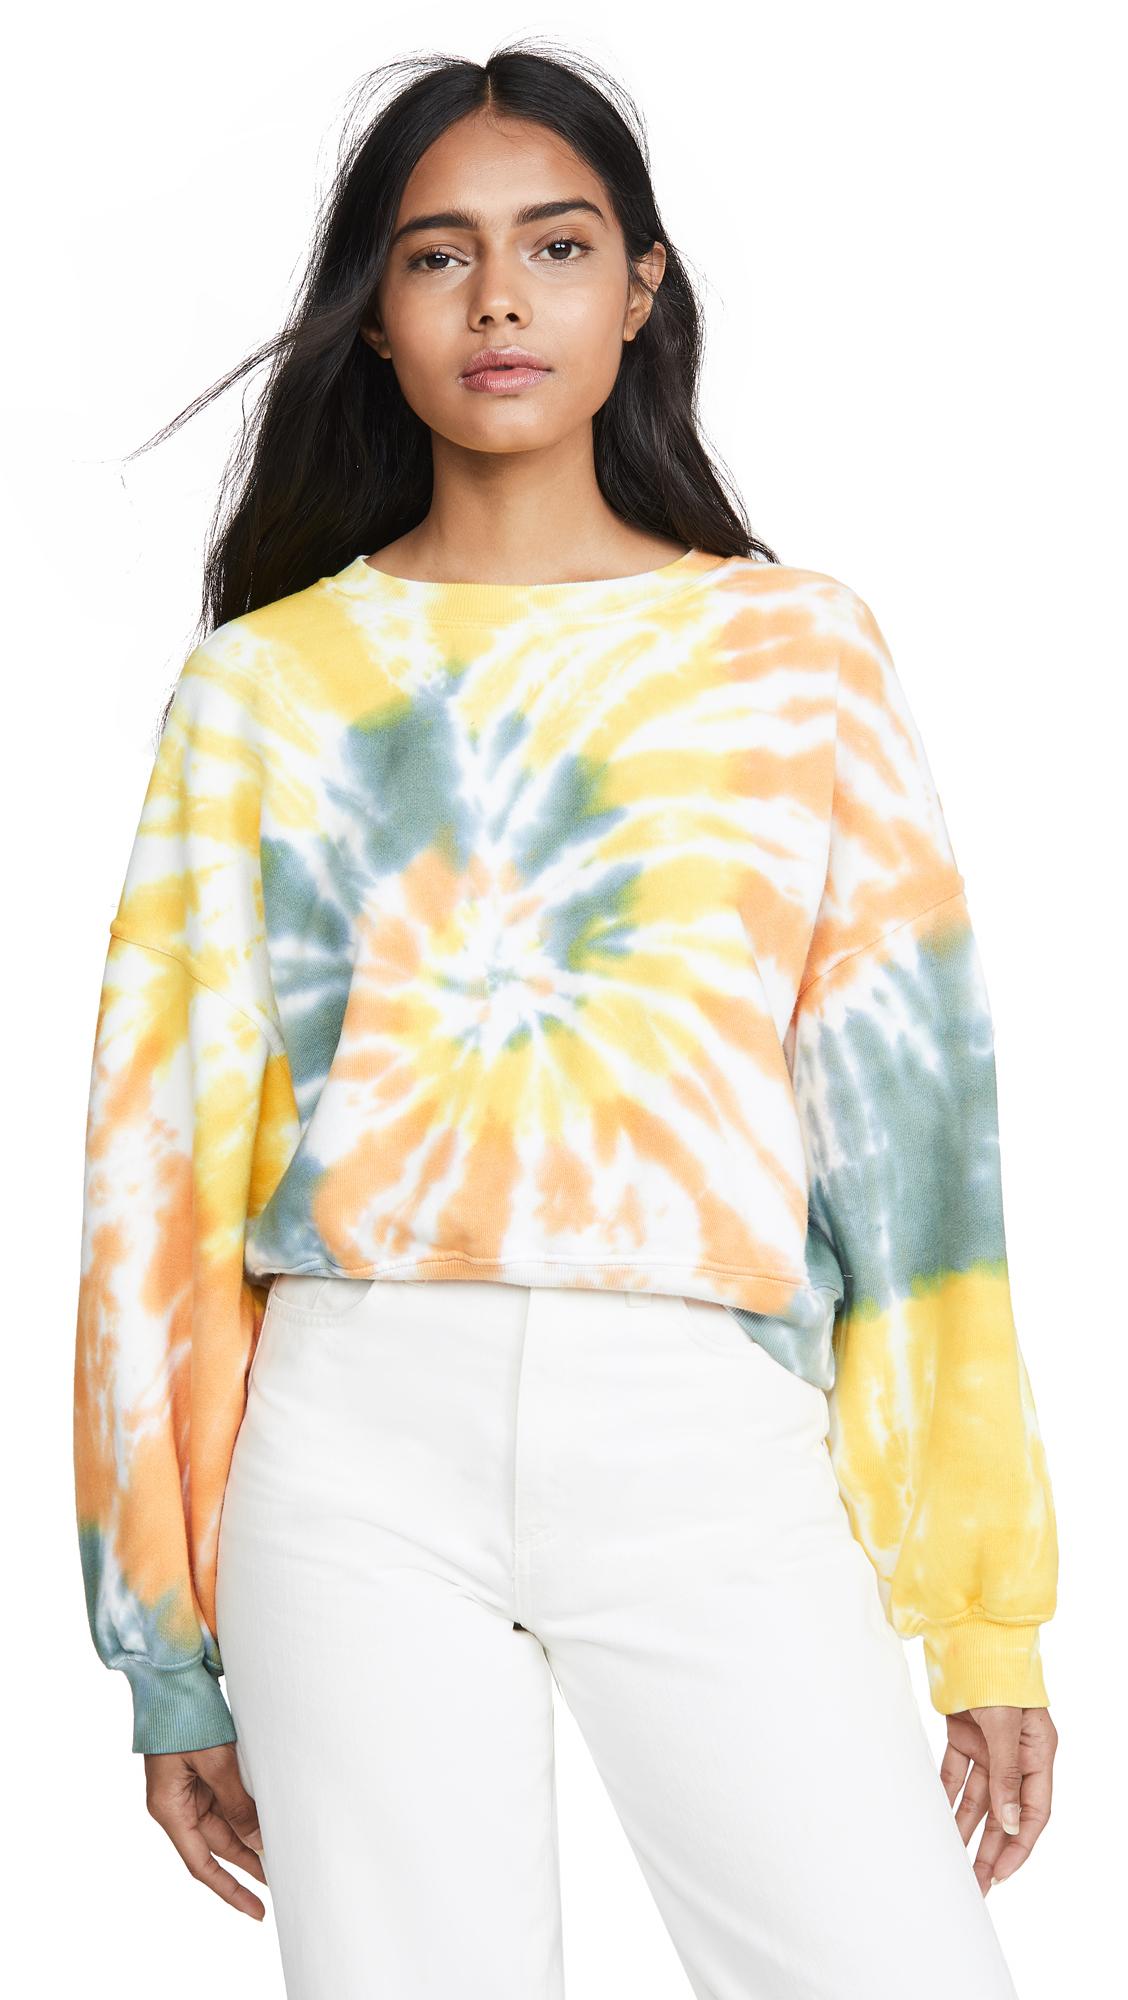 AGOLDE Balloon Sleeve Sweatshirt - Swirled